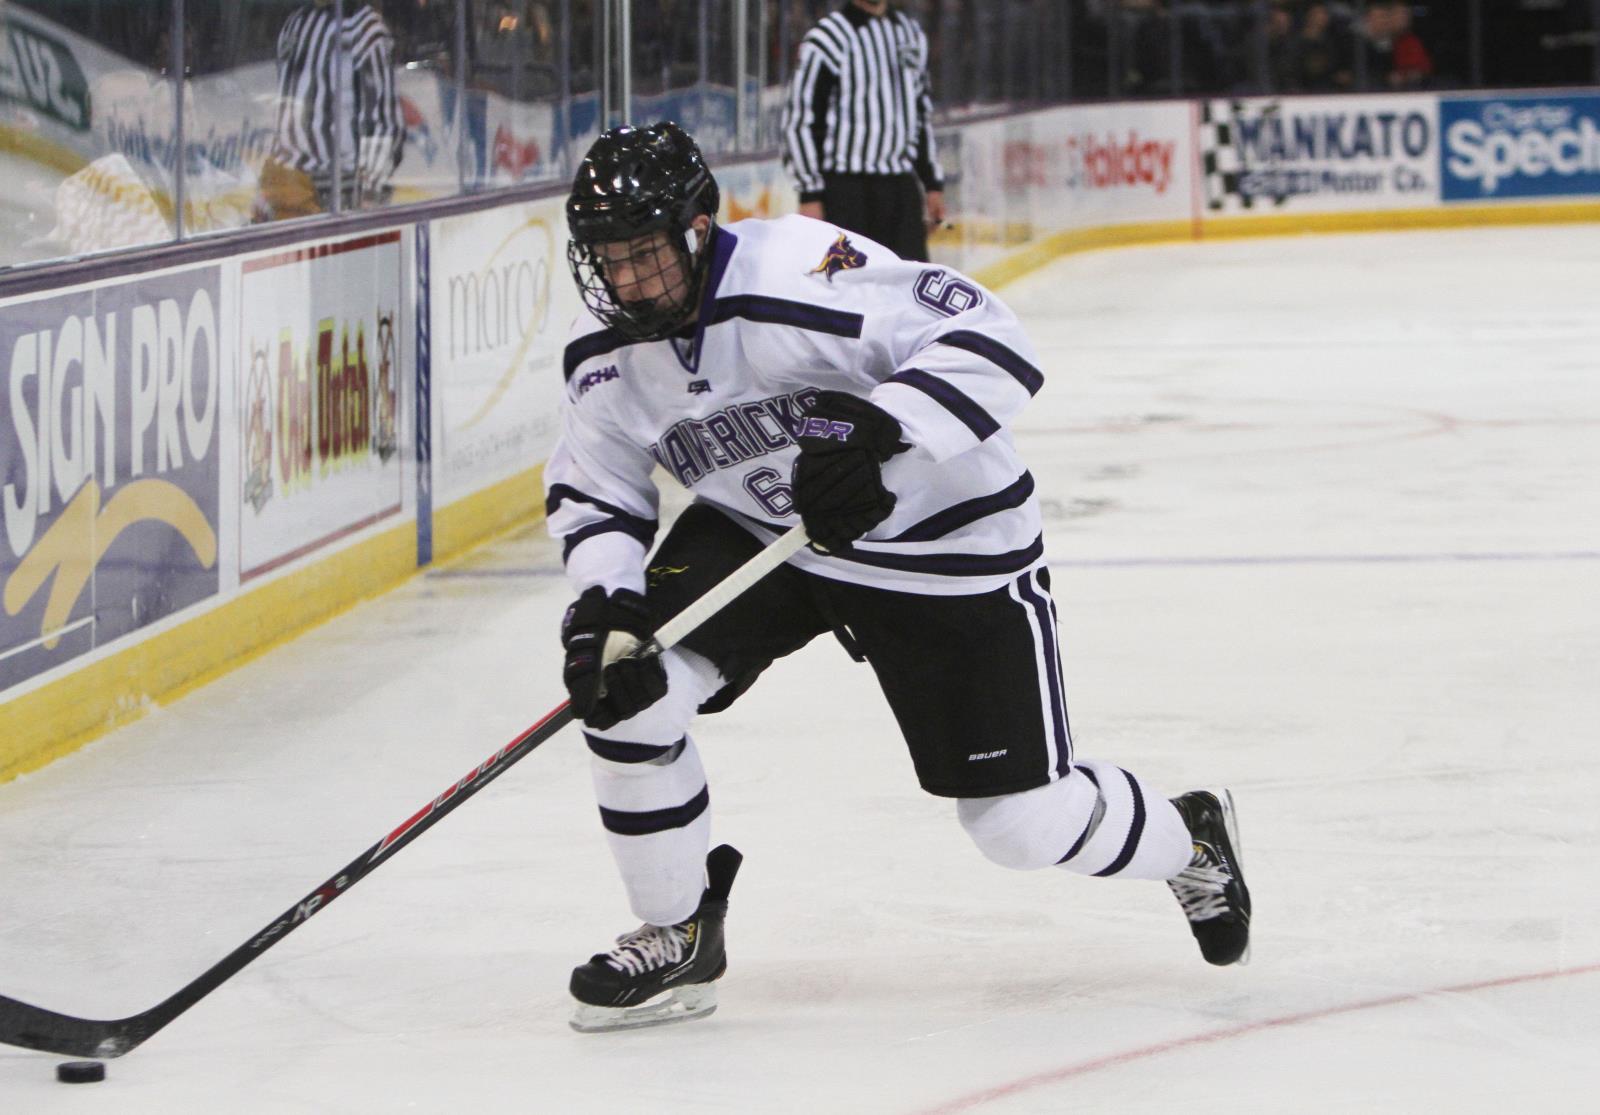 sale retailer 99c63 52374 MSU Men's Hockey VS Lake Superior State | Mankato Civic Center